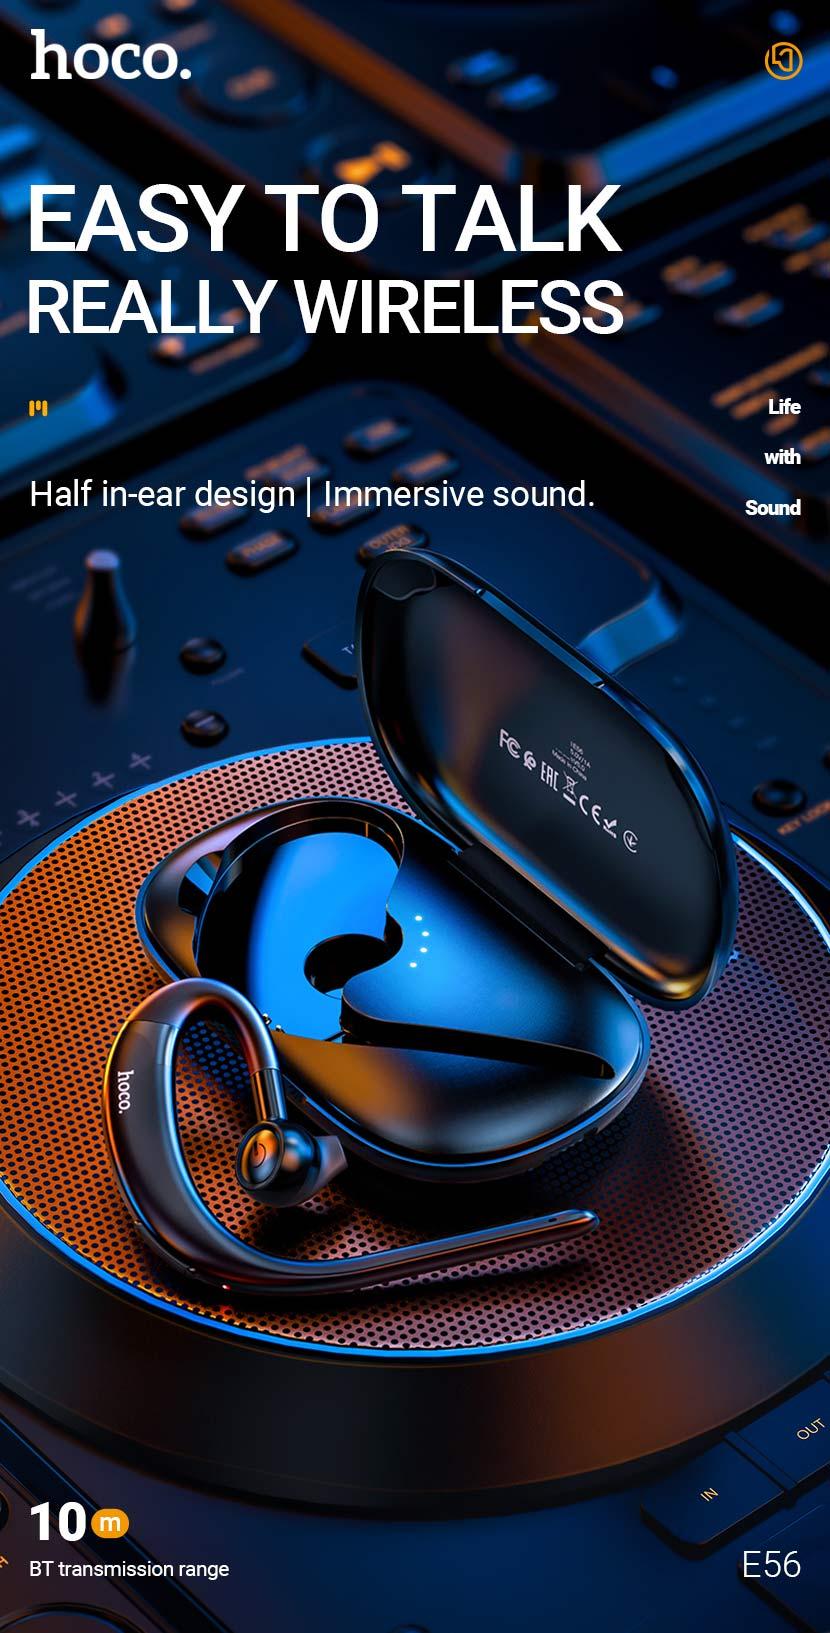 hoco news e56 shine business wireless headset en